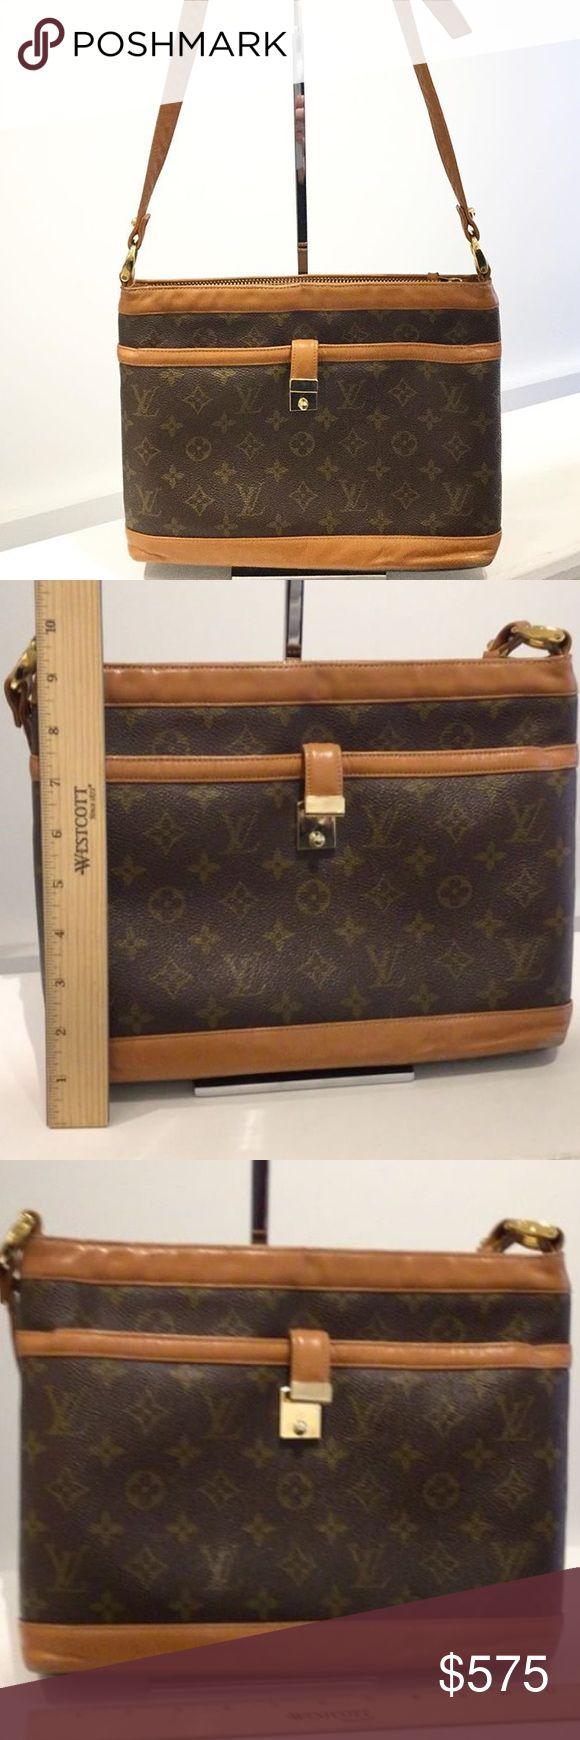 100% Authentic Vintage Louis Vuitton Shoulder Bag 100% Authentic Vintage Louis Vuitton Shoulder Bag.  Good used vintage condition. Sold in As Is Condition (see detailed pics). Louis Vuitton Bags Shoulder Bags